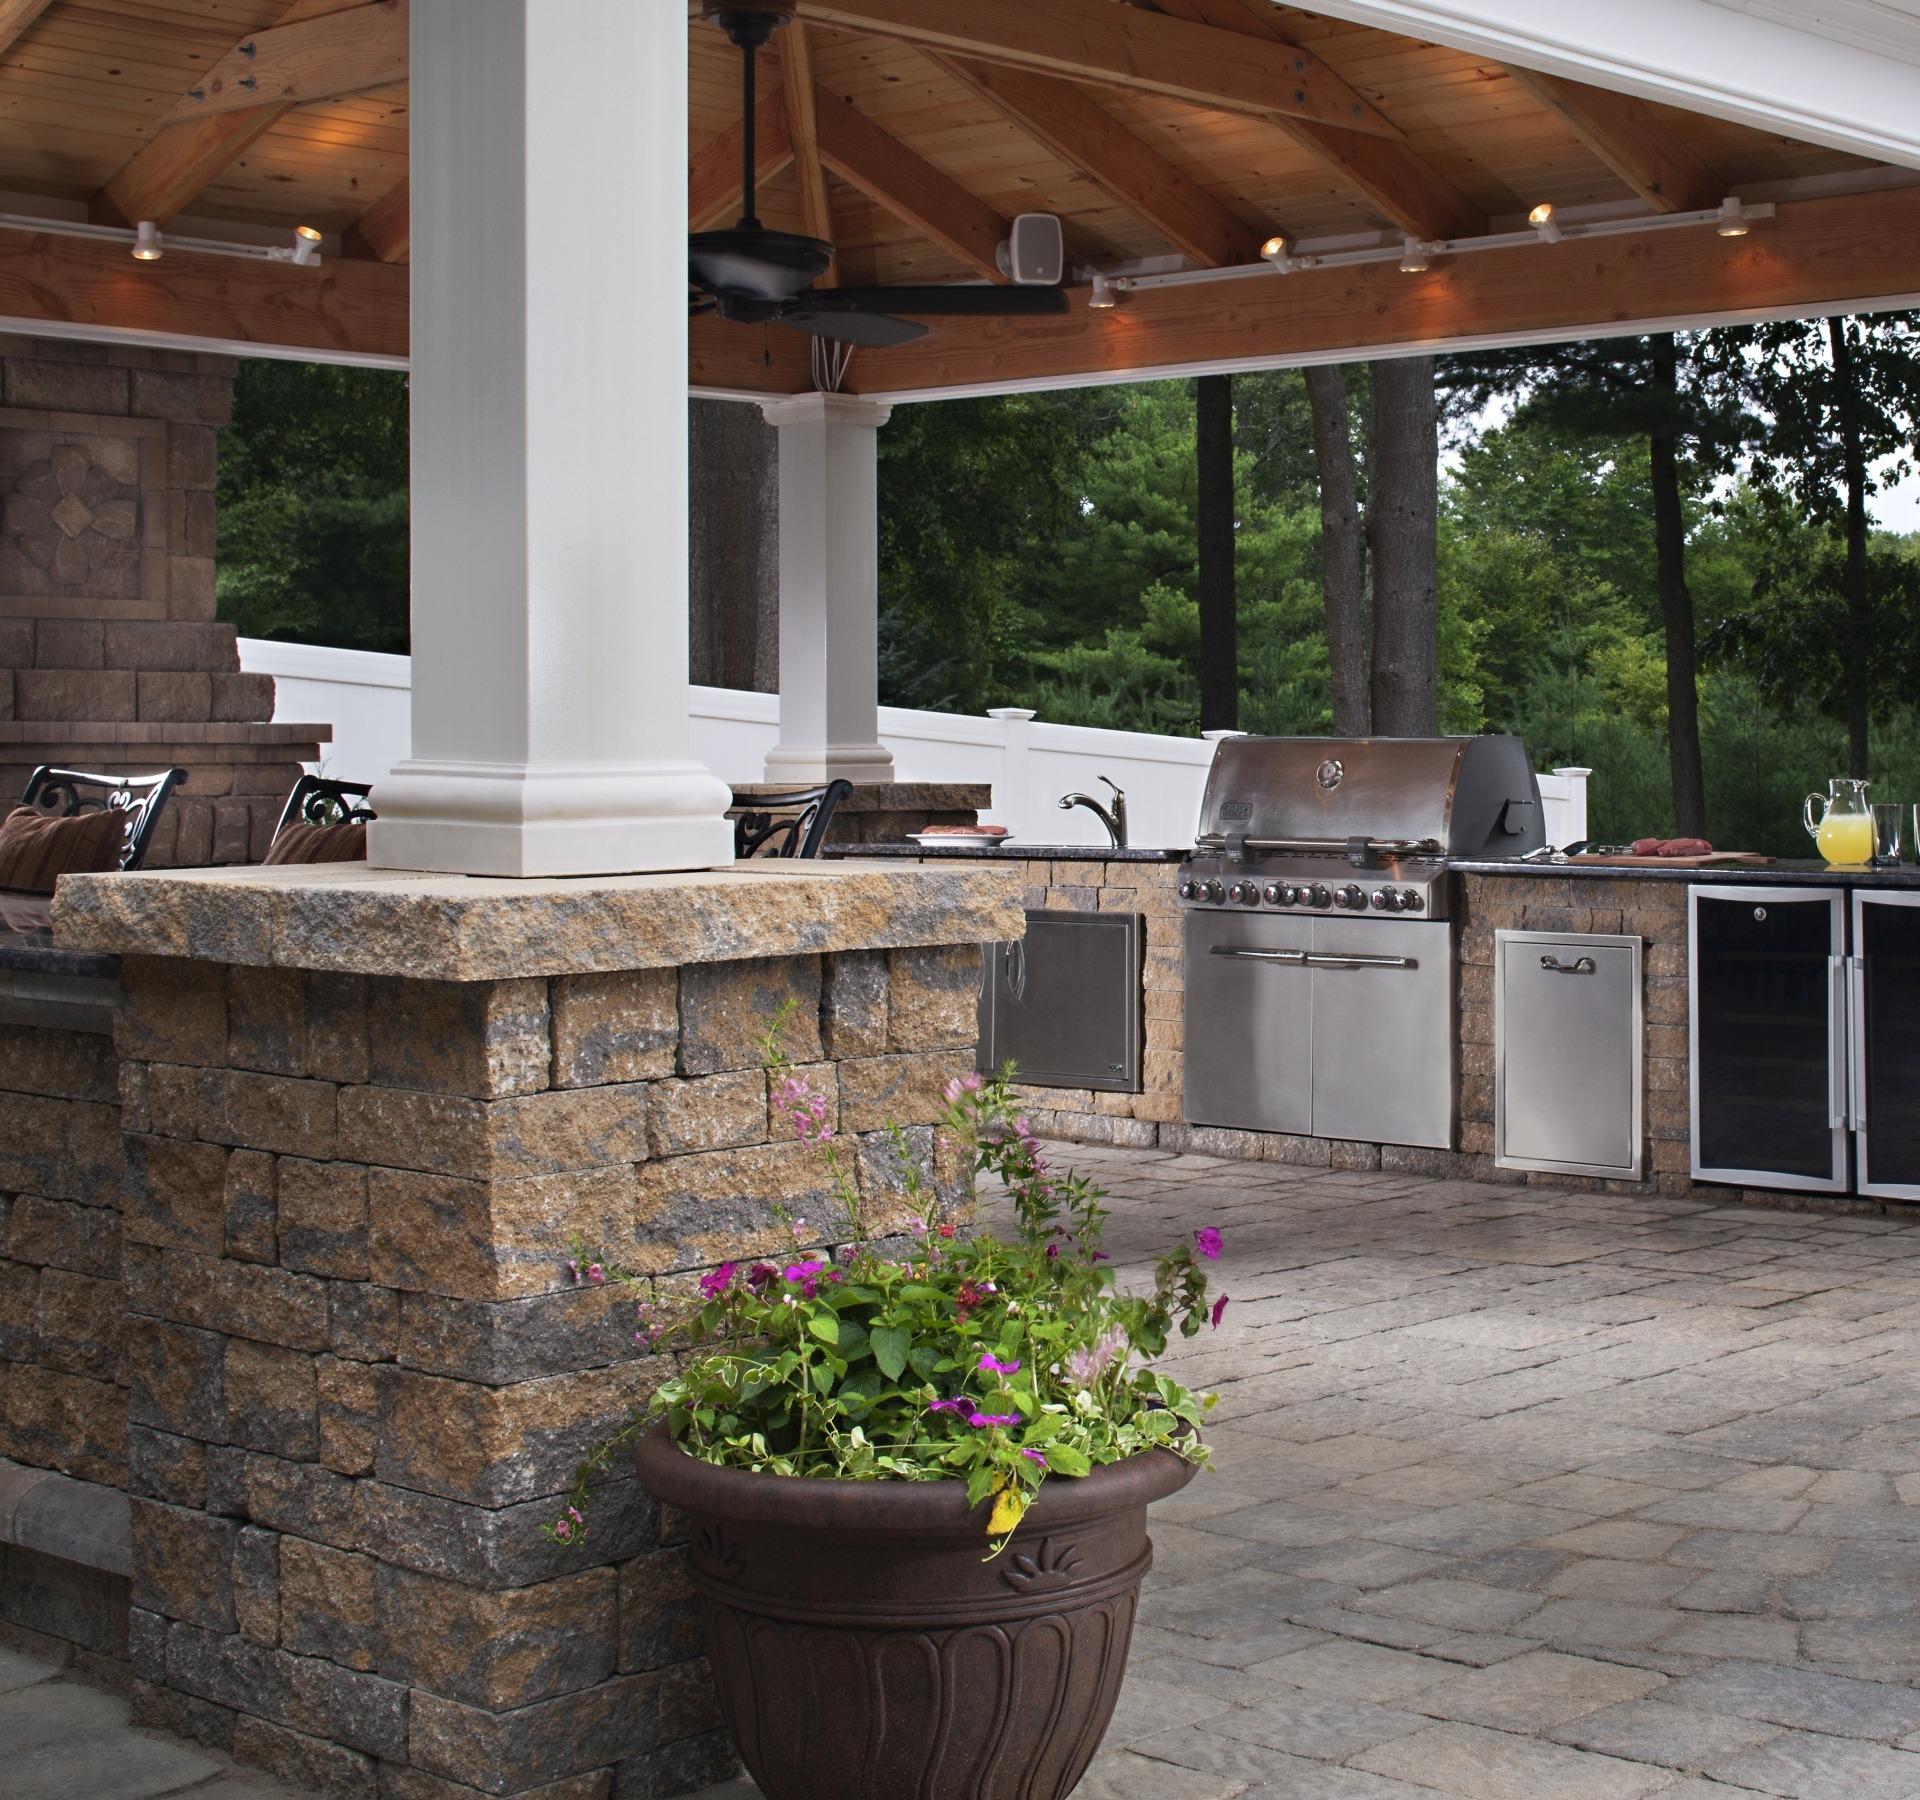 Paving Stones Outdoor Kitchen